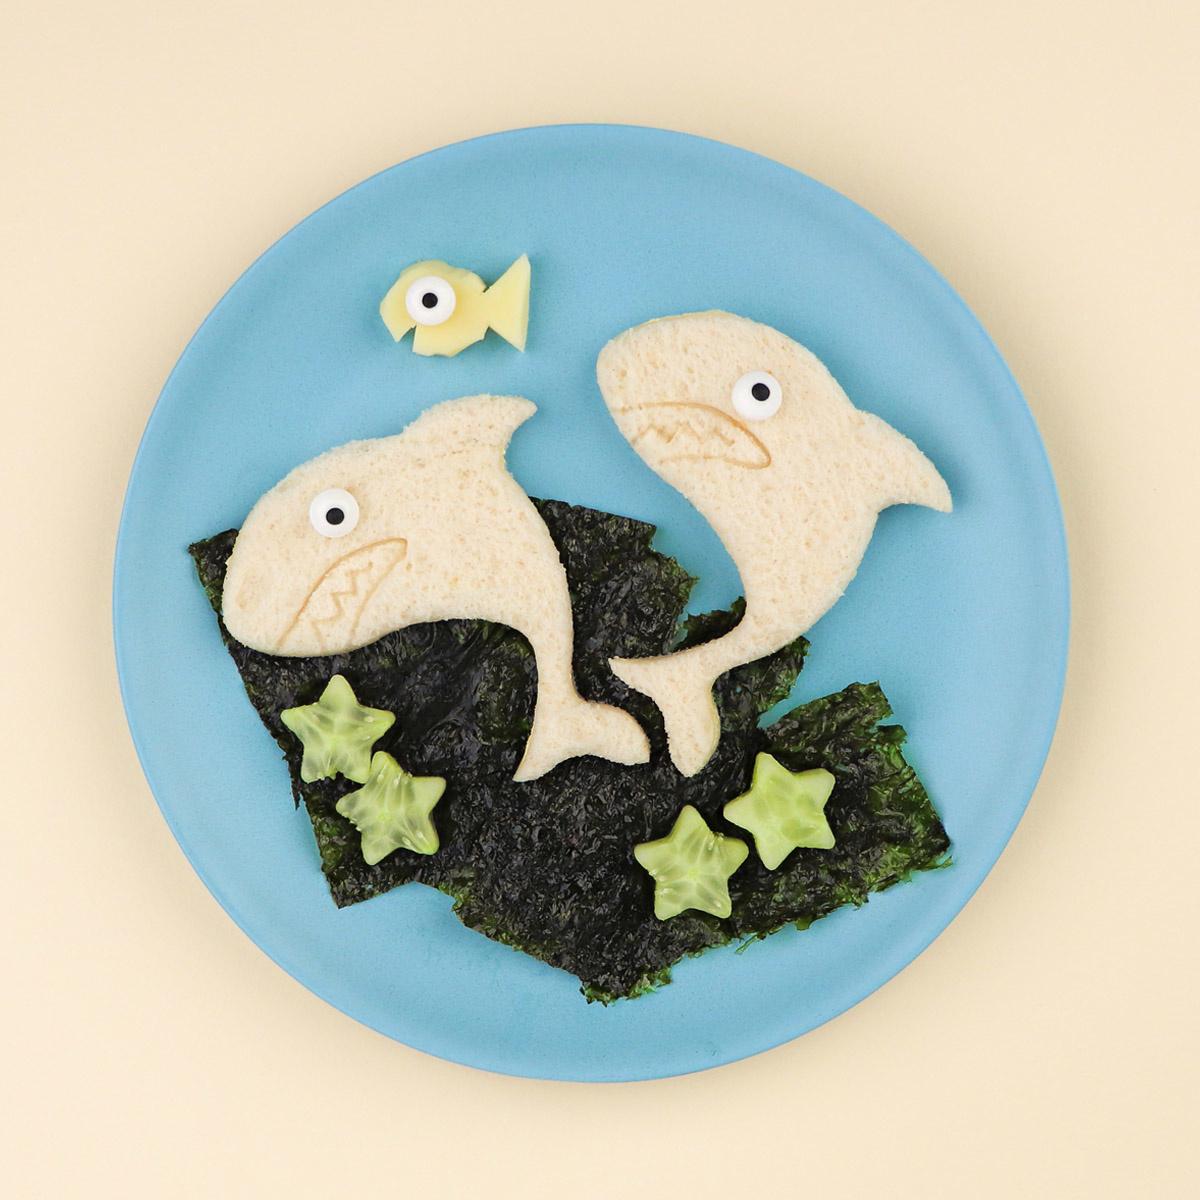 Lunch Punch Sandwich Cutters - Shark-3